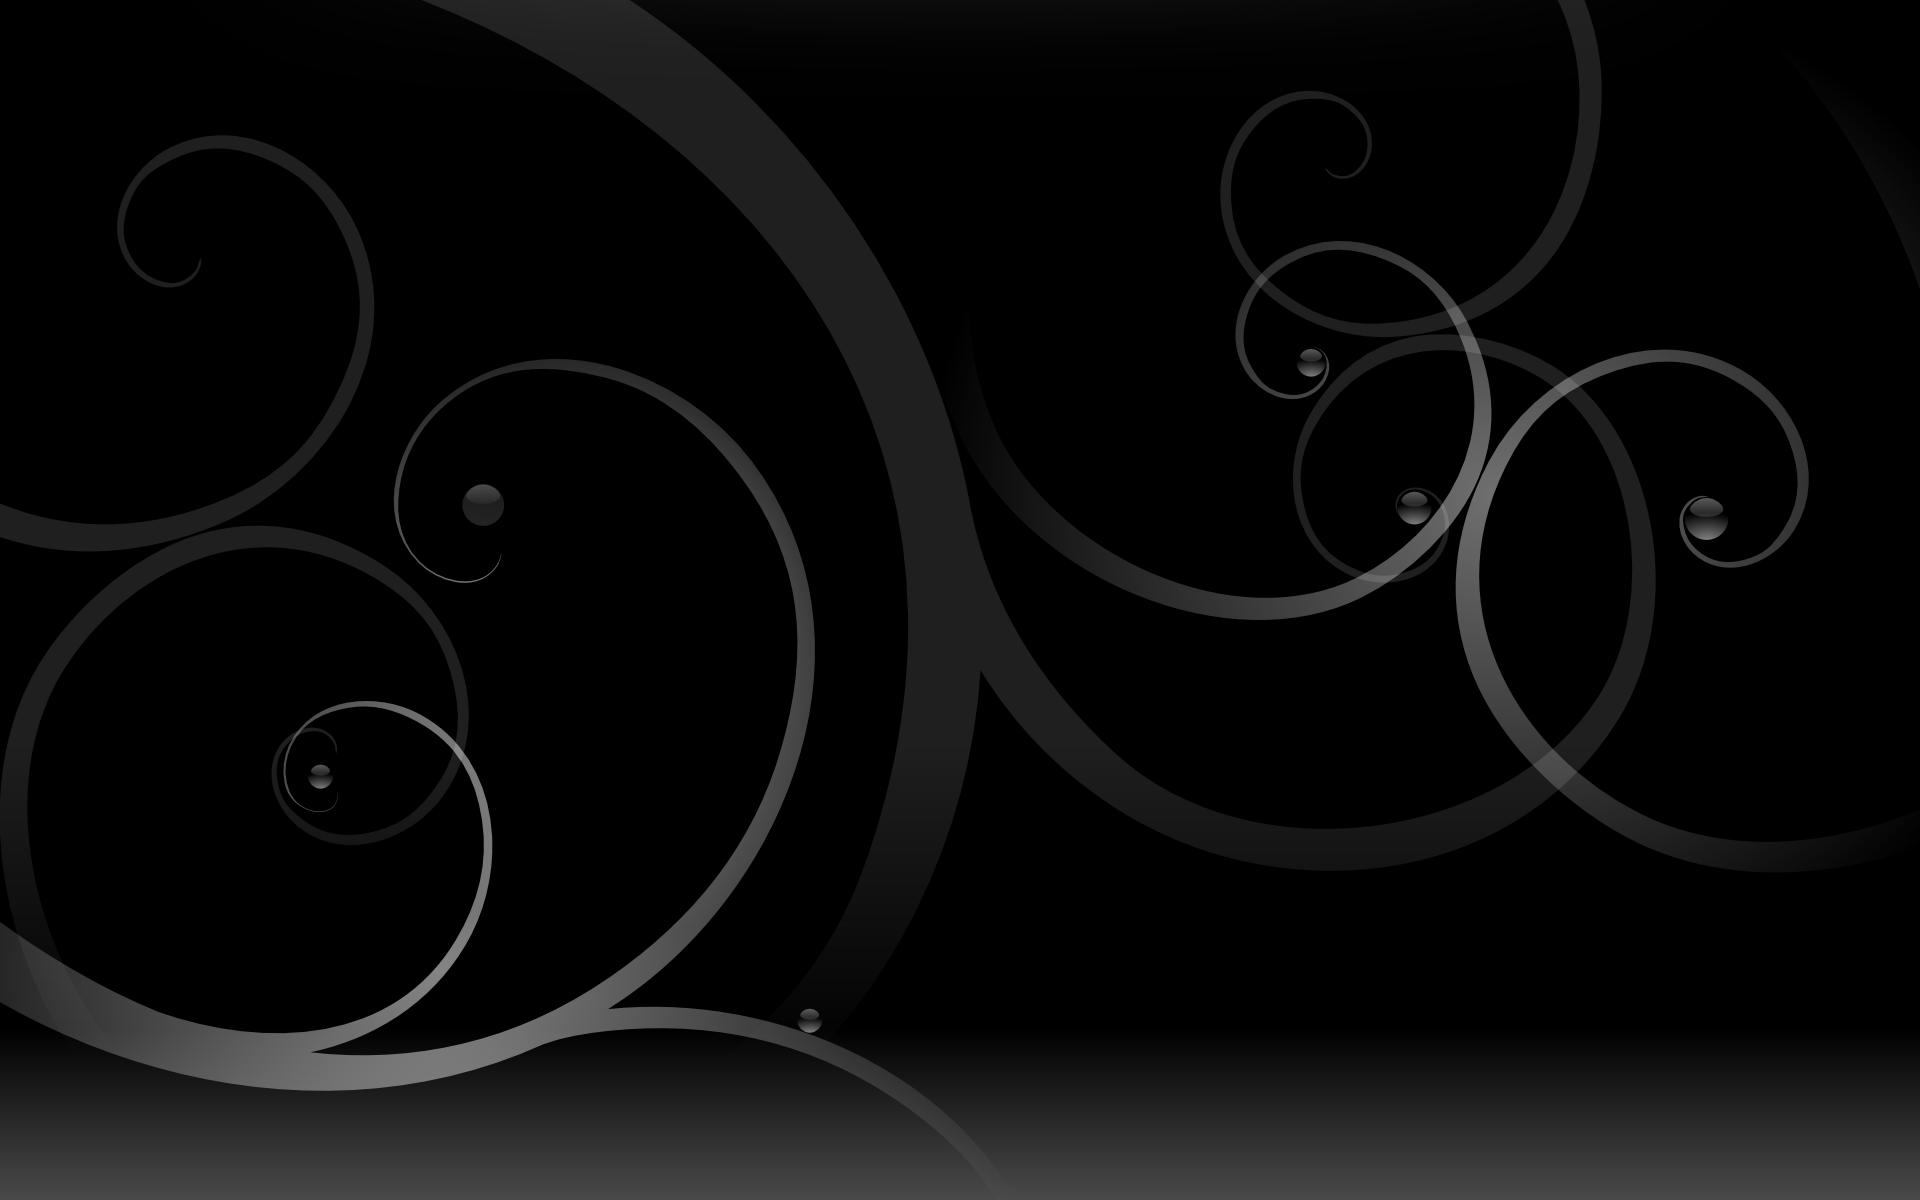 Background image black - Black Swirls Wallpaper 73530